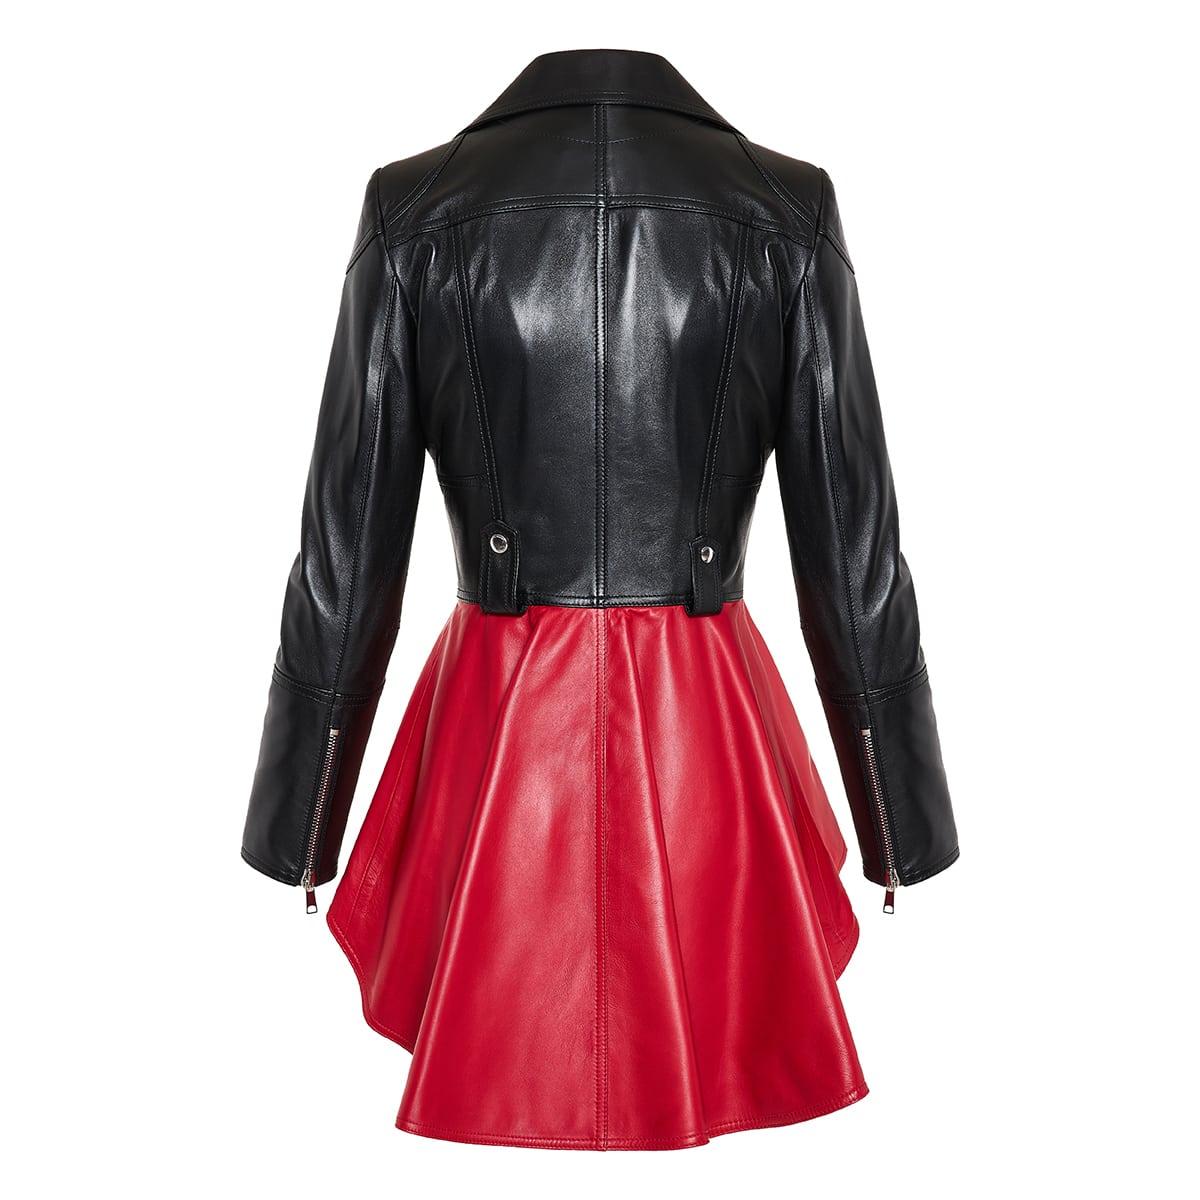 Two-tone peplum leather biker jacket